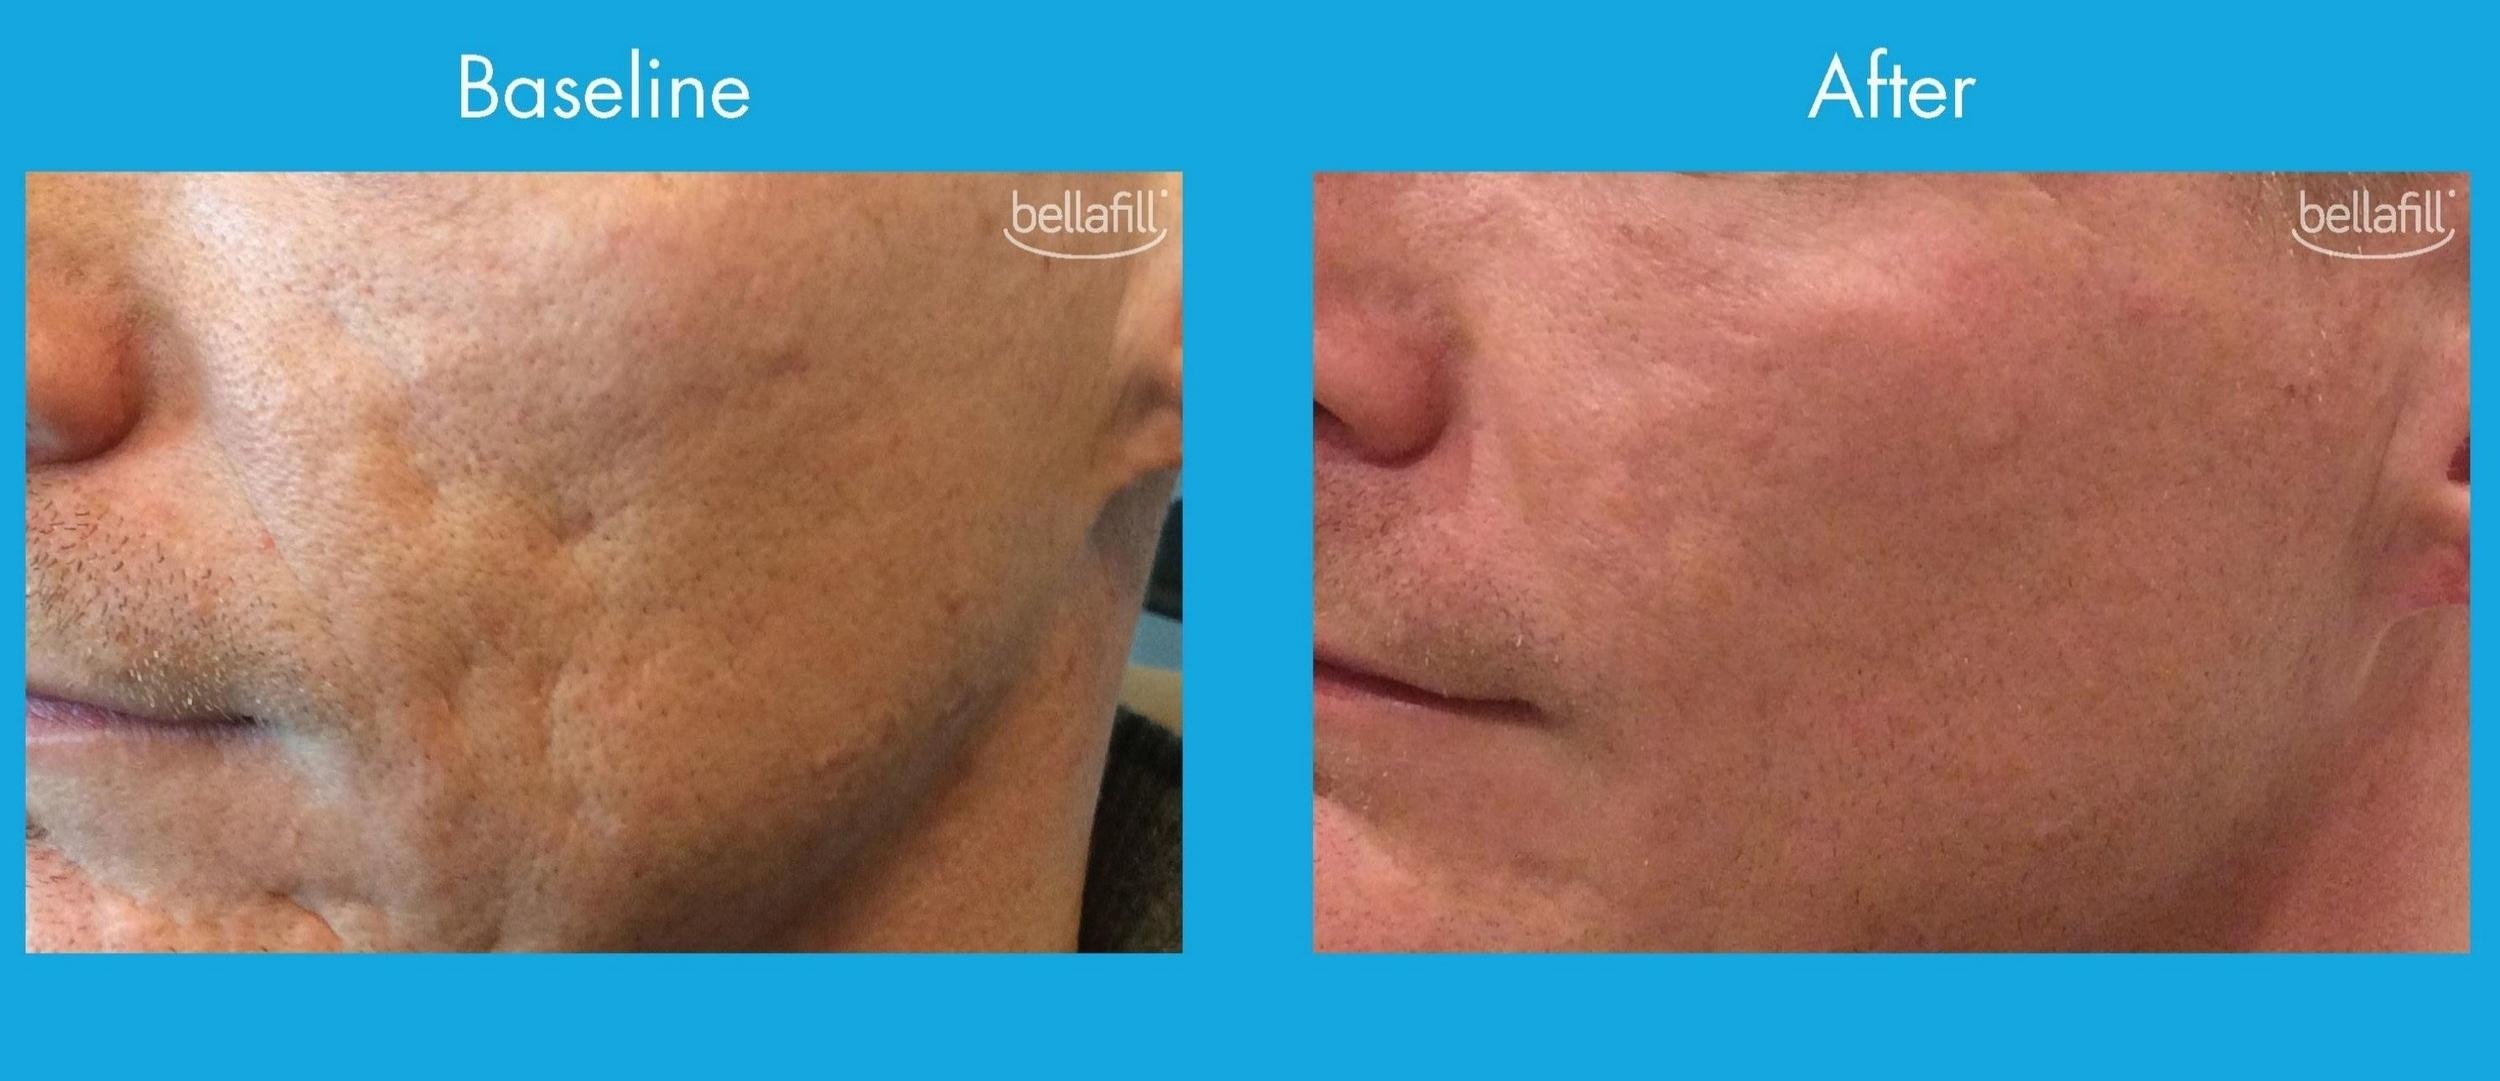 Bellafill_acne6.JPG